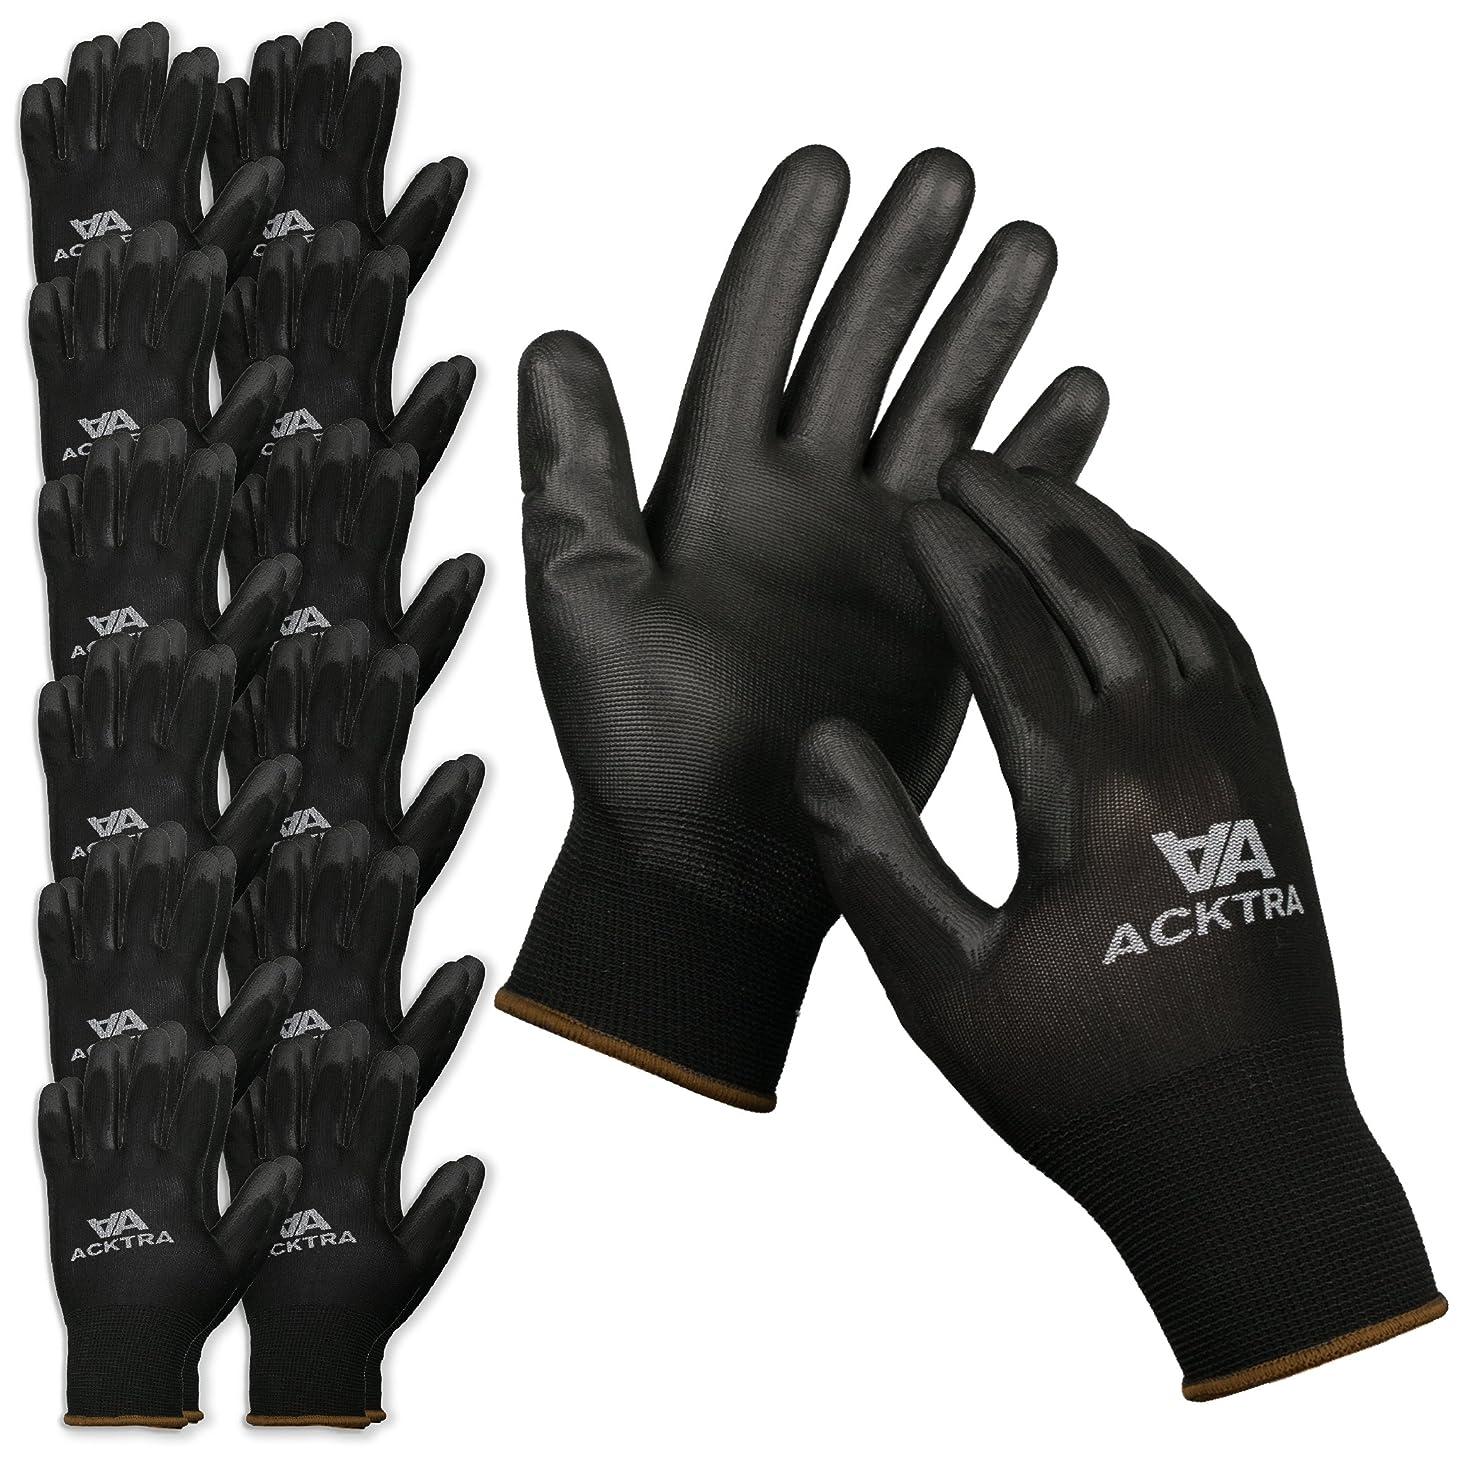 ACKTRA Ultra-Thin Polyurethane (PU) Coated Nylon Safety WORK GLOVES 12 Pairs, Knit Wrist Cuff, for Precision Work, for Men & Women, WG002 Black Medium